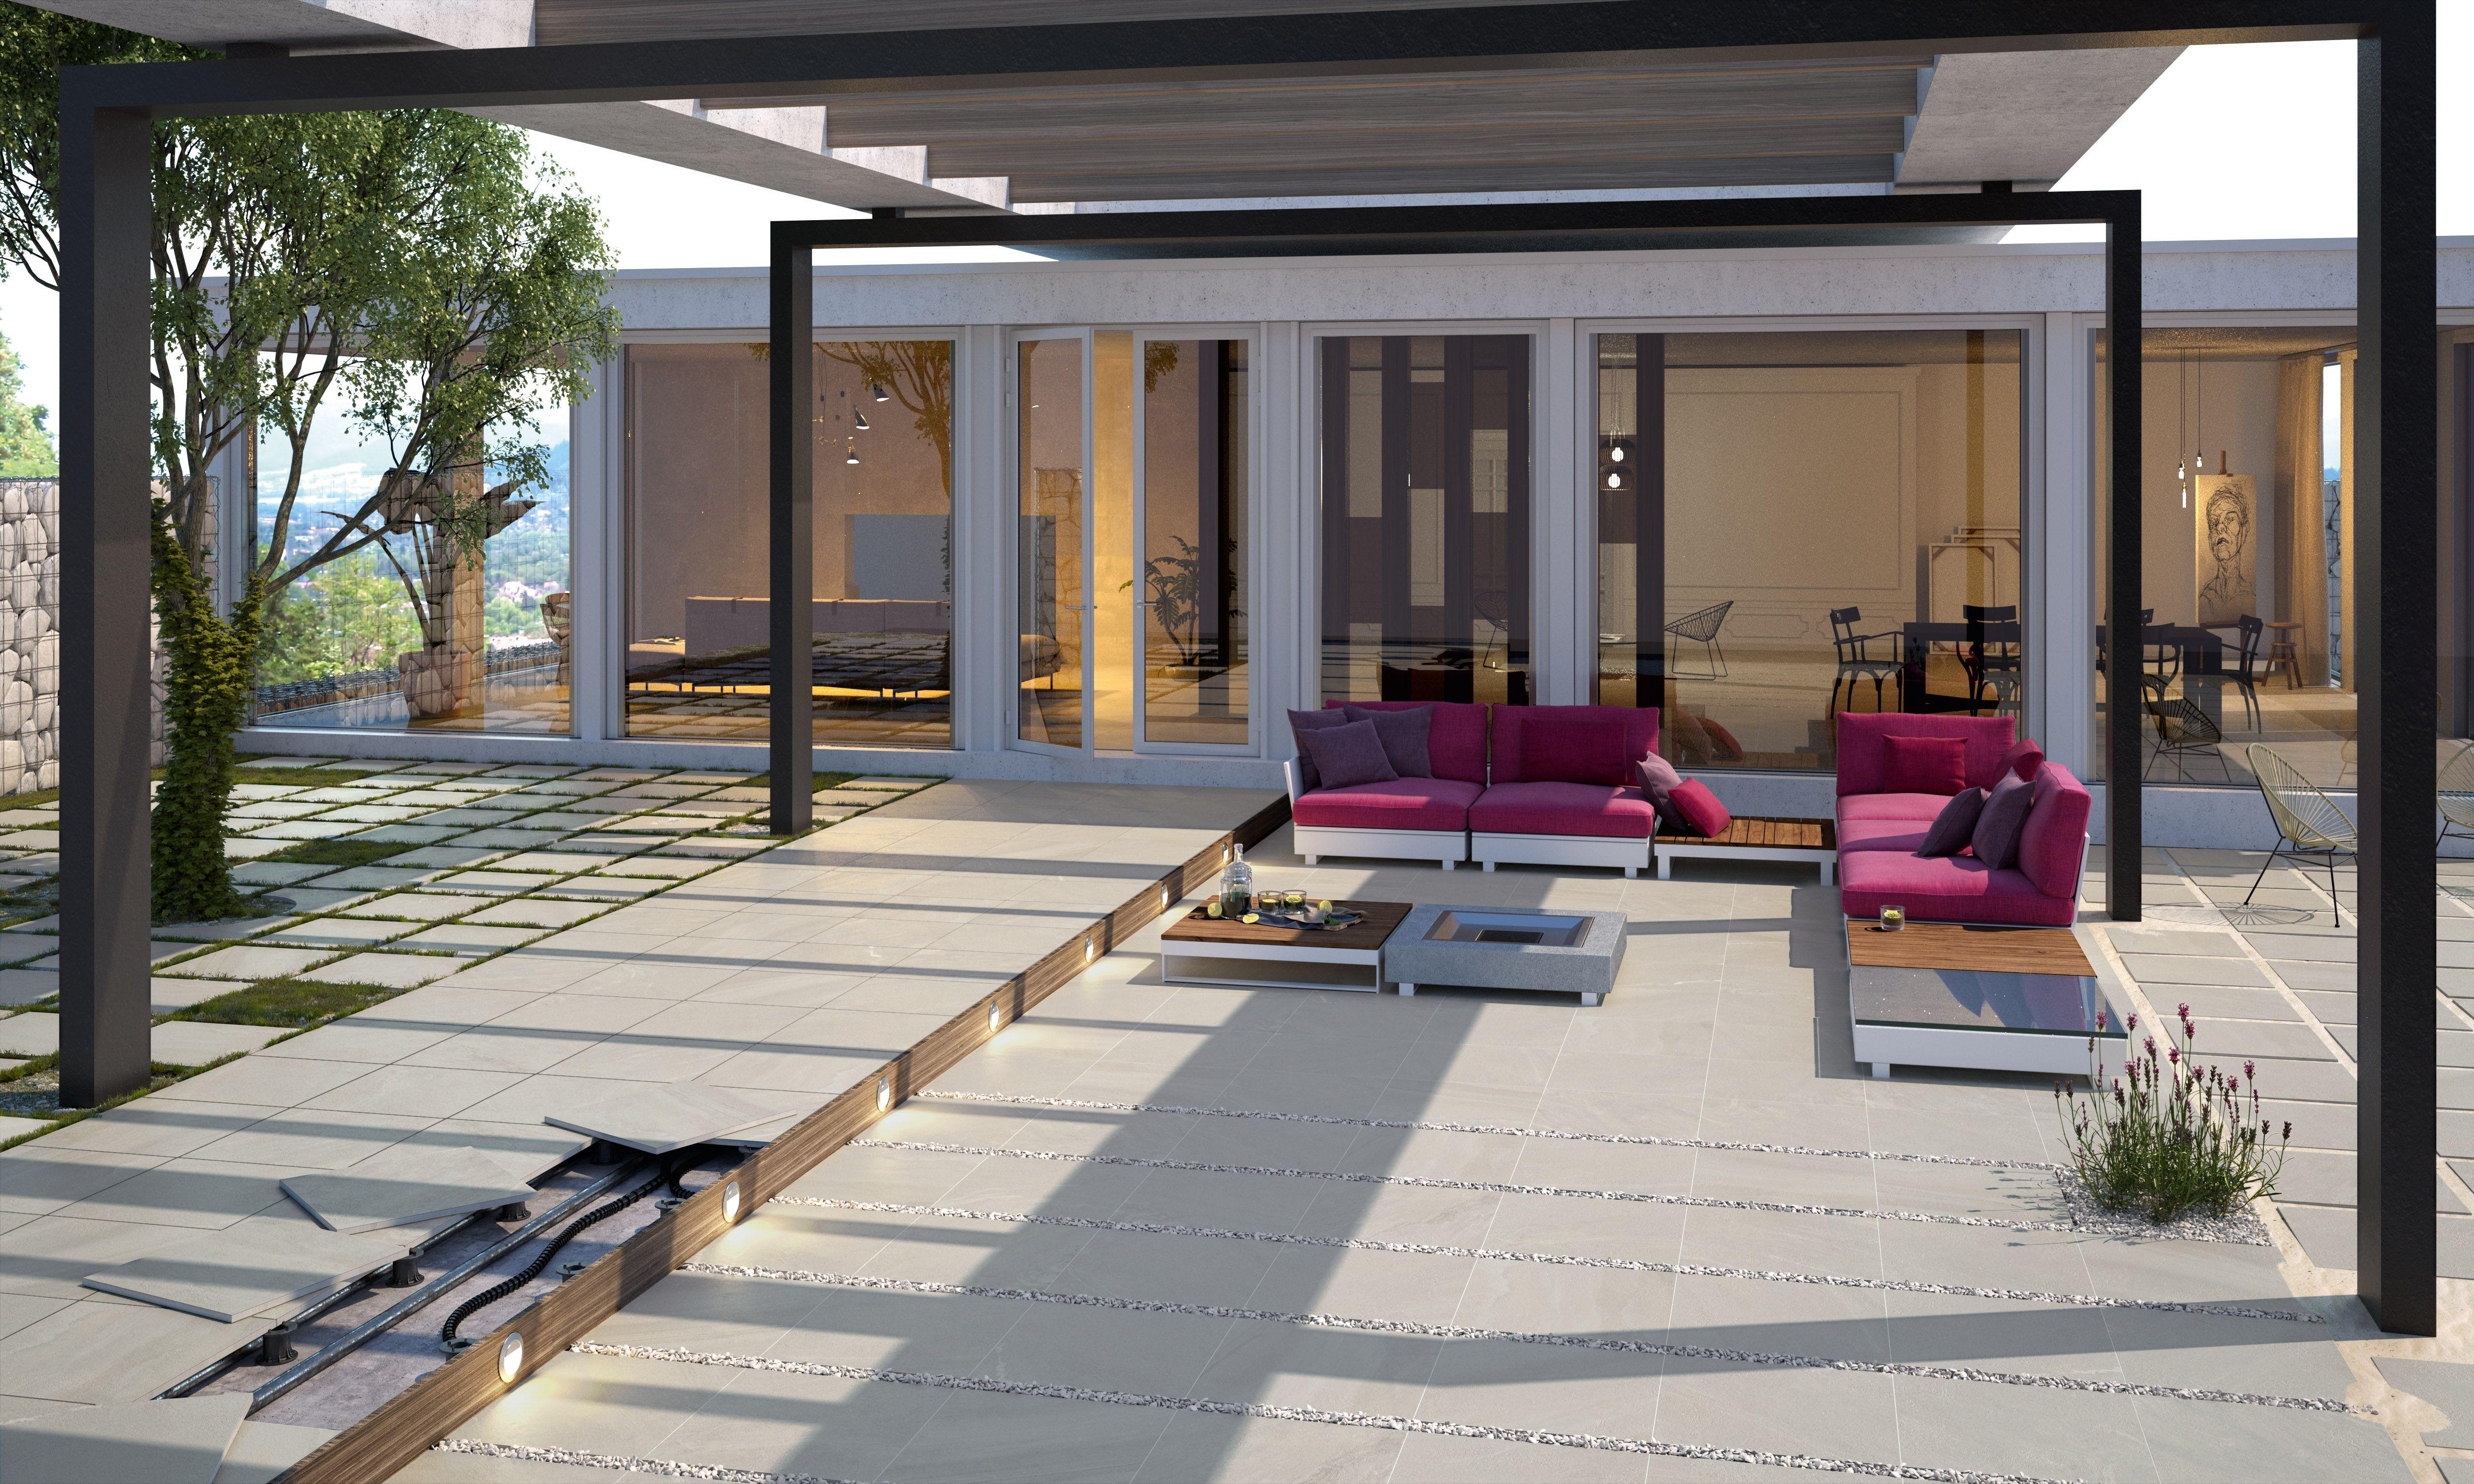 Duplo Badezimmer ~ Code collection colorker duplo mm outdoors tiles